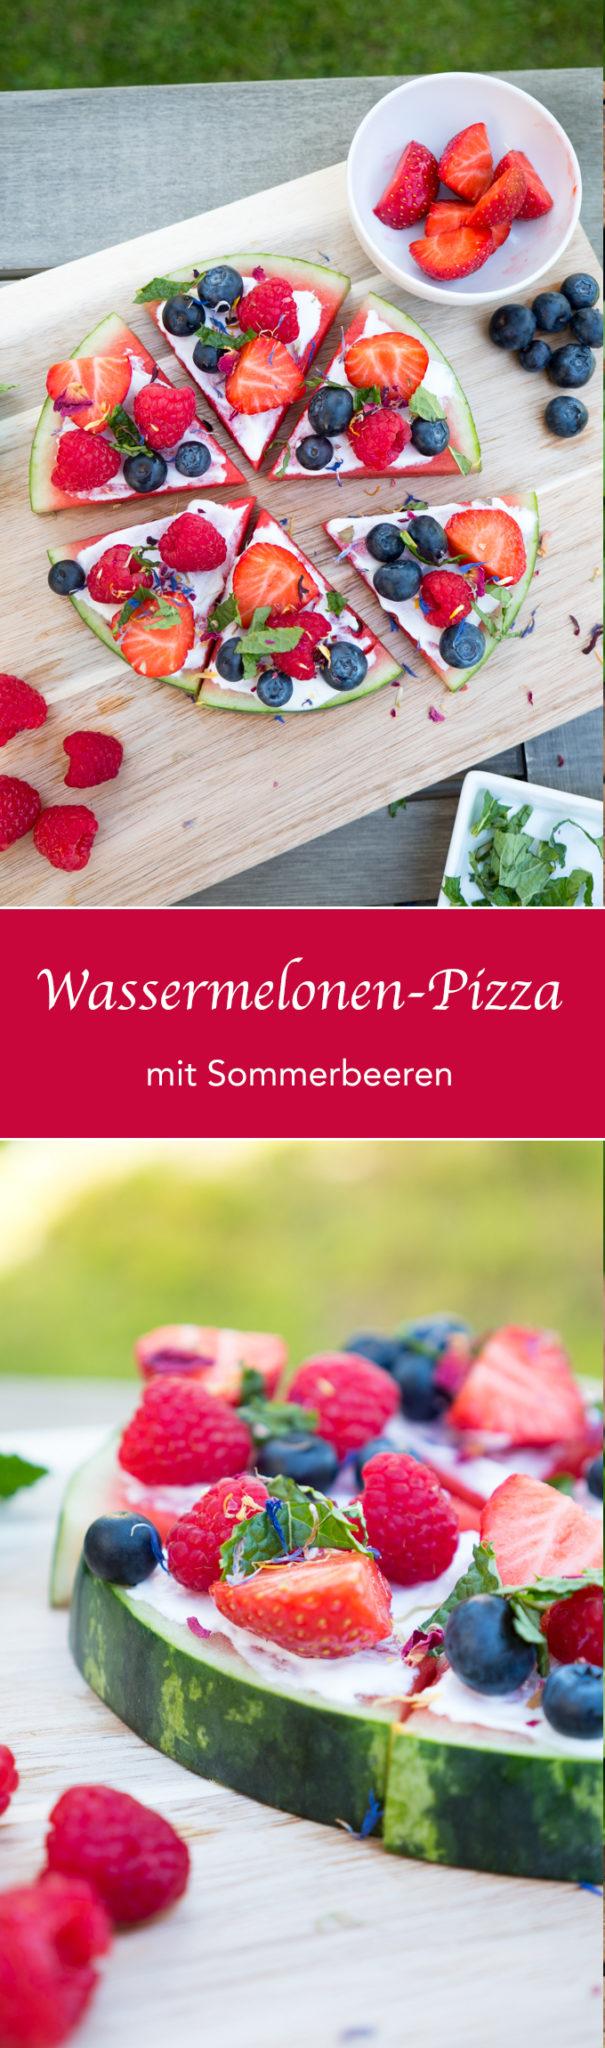 Wassermelonen-Pizza mit Sommerbeeren